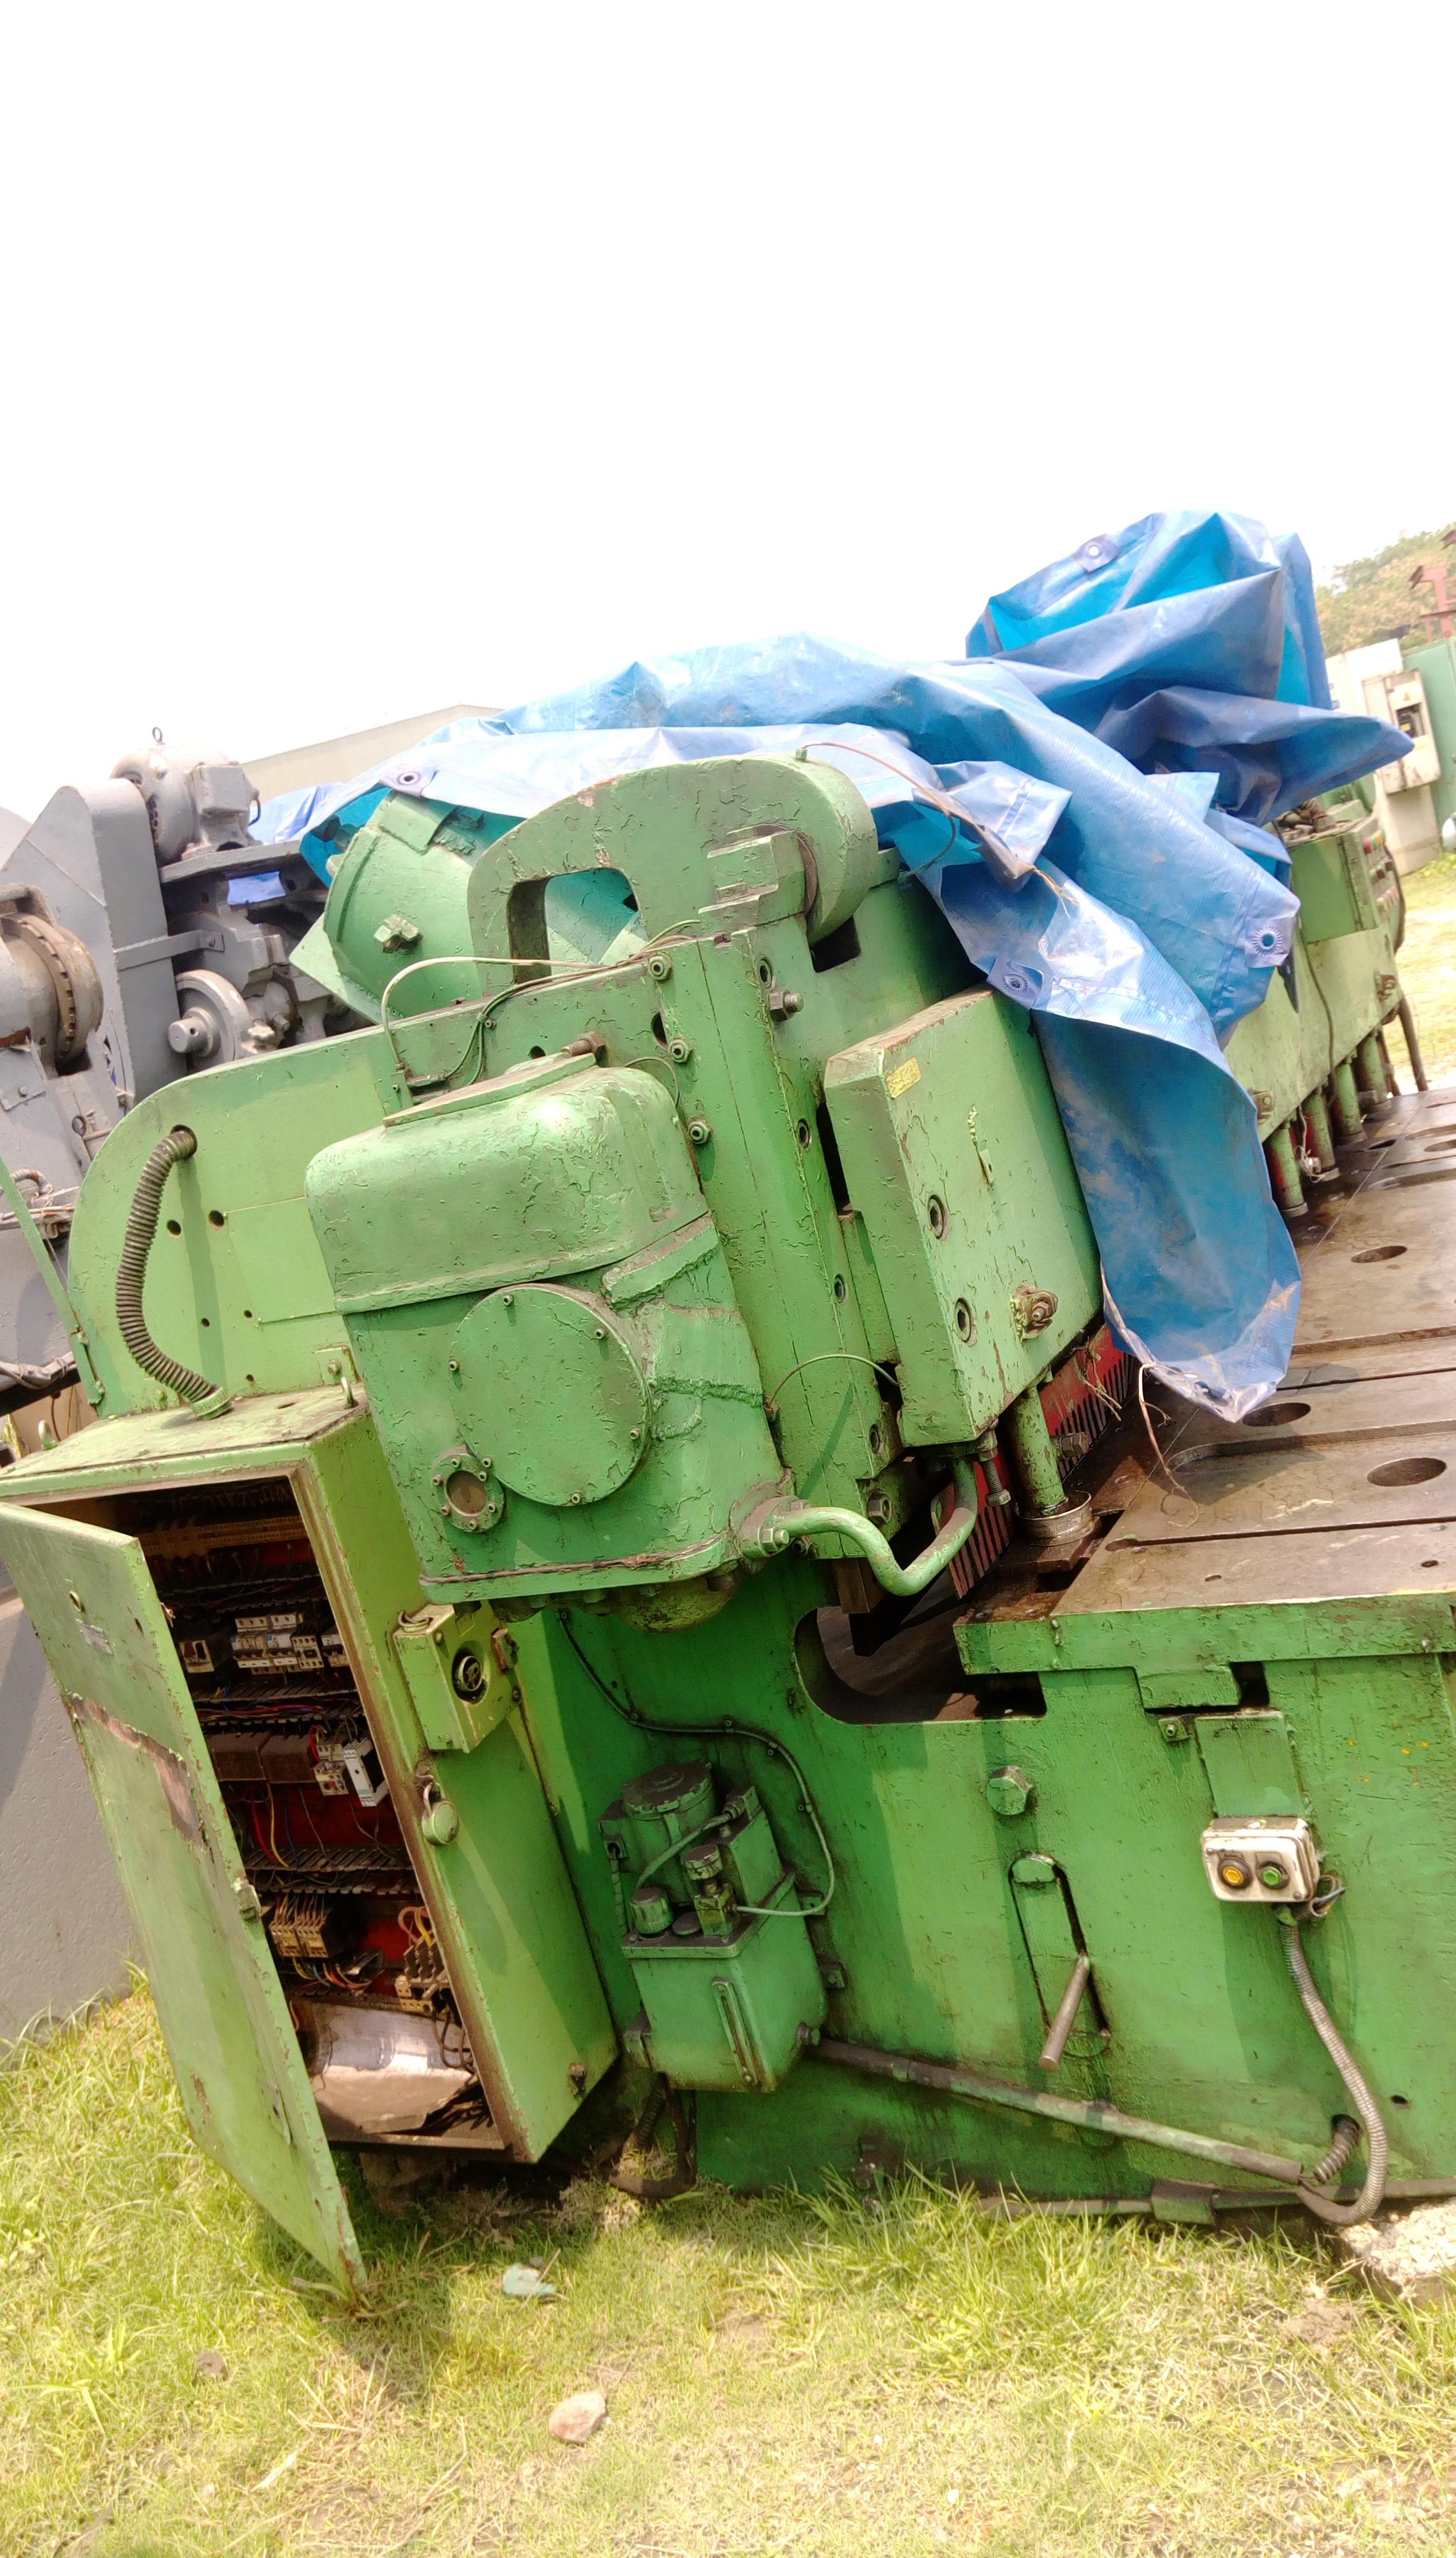 Godrej make Shearing Machine - 10mm x 2500mm